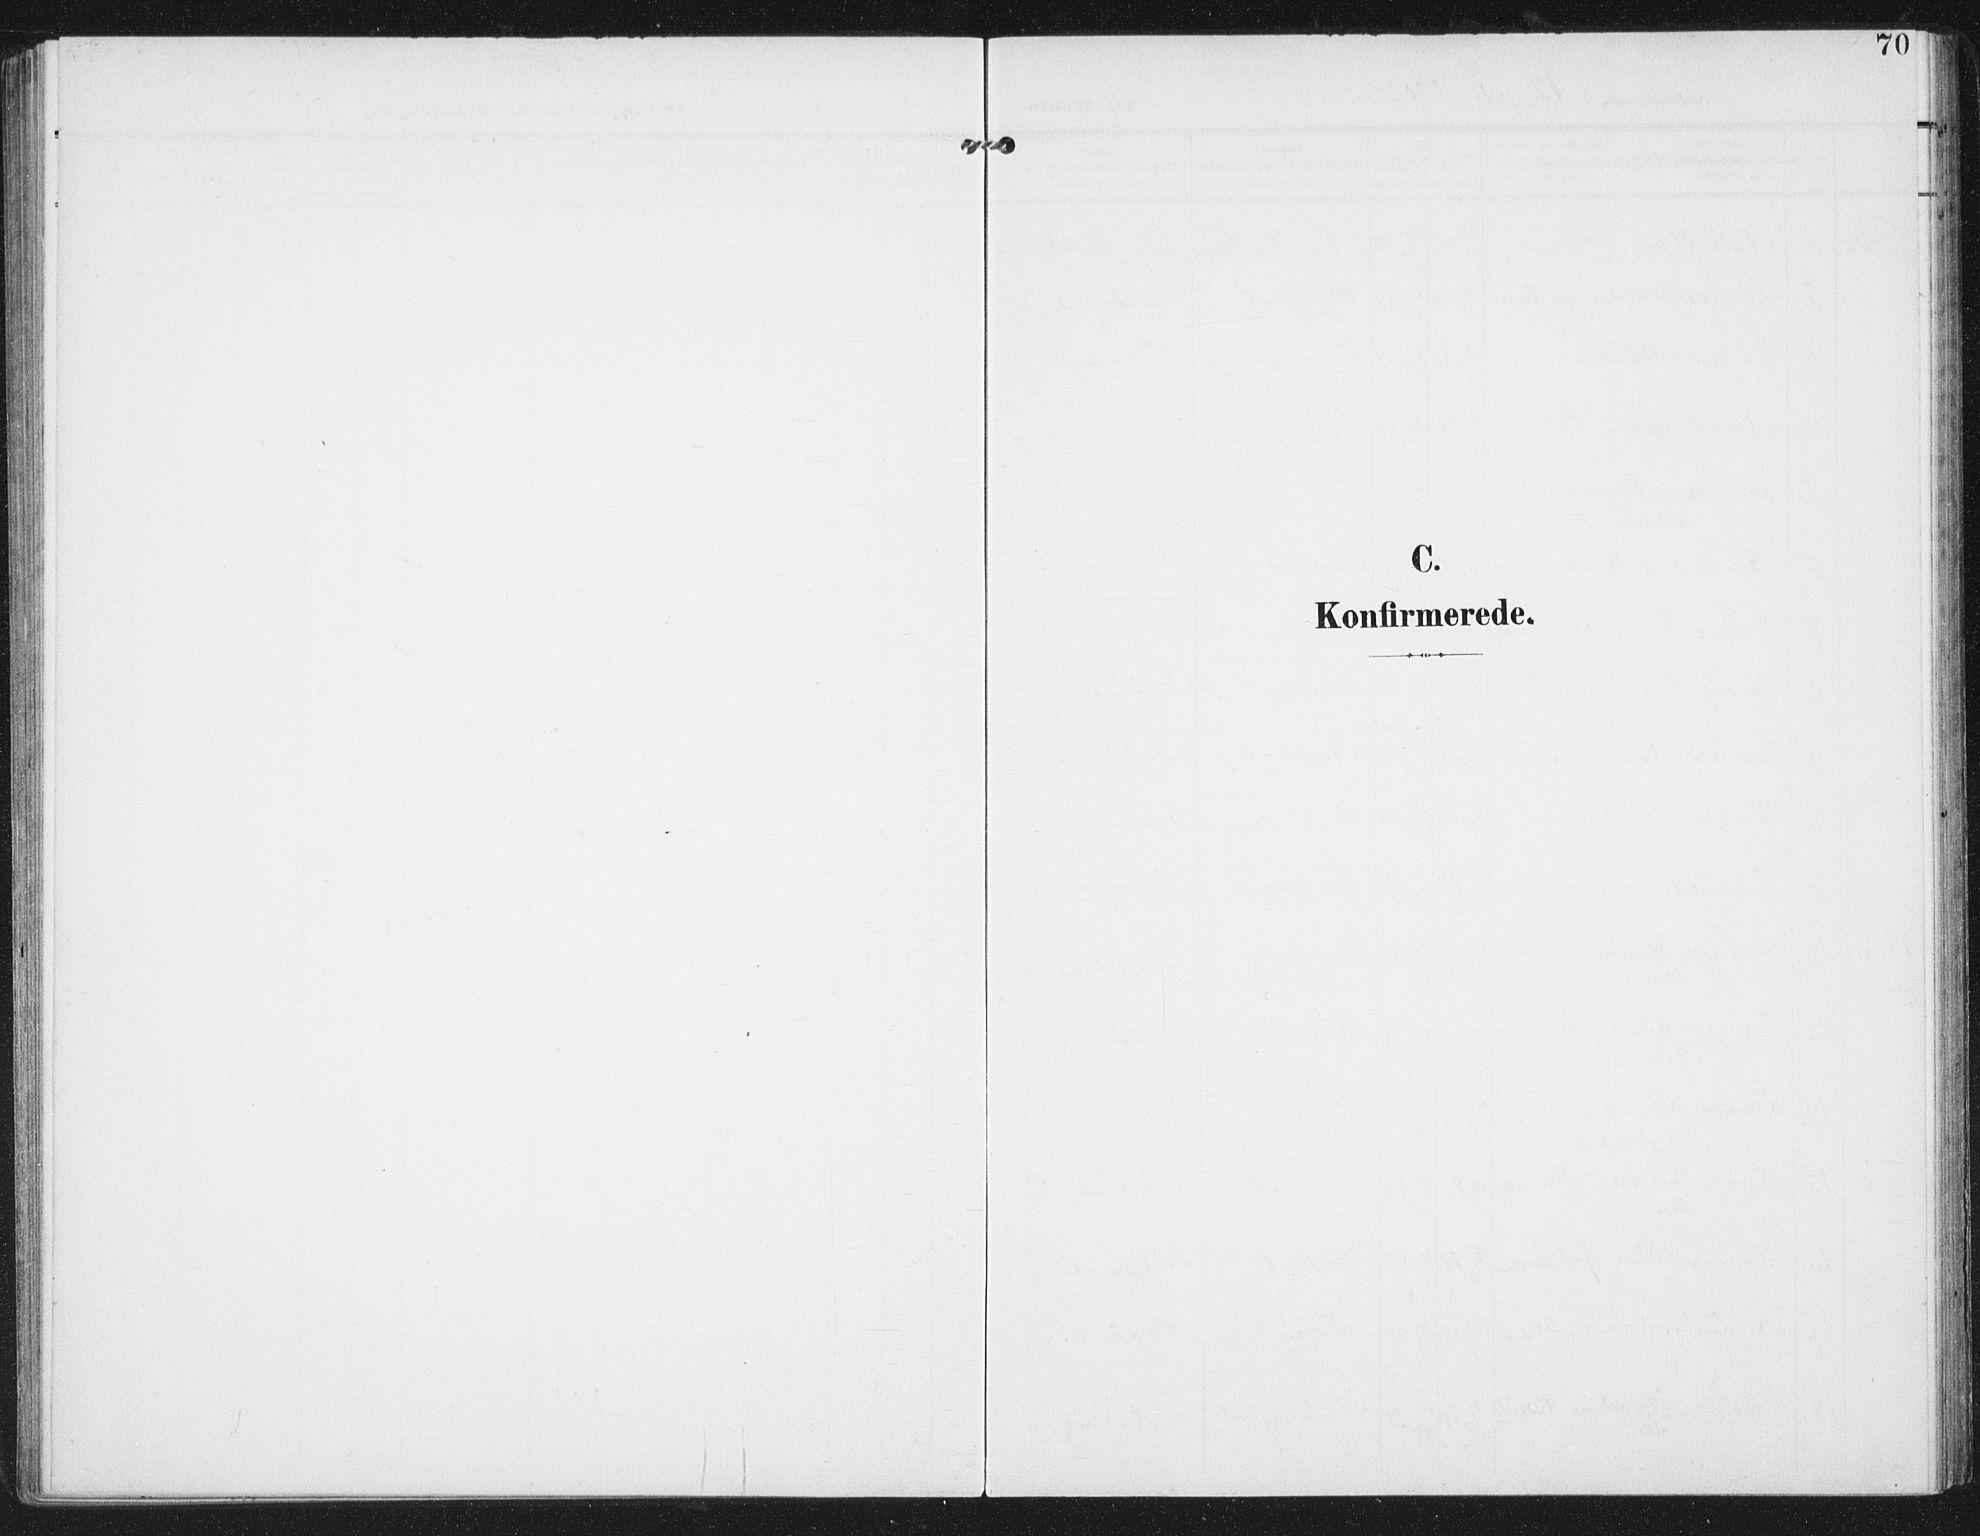 SAT, Ministerialprotokoller, klokkerbøker og fødselsregistre - Nordland, 886/L1221: Ministerialbok nr. 886A03, 1903-1913, s. 70